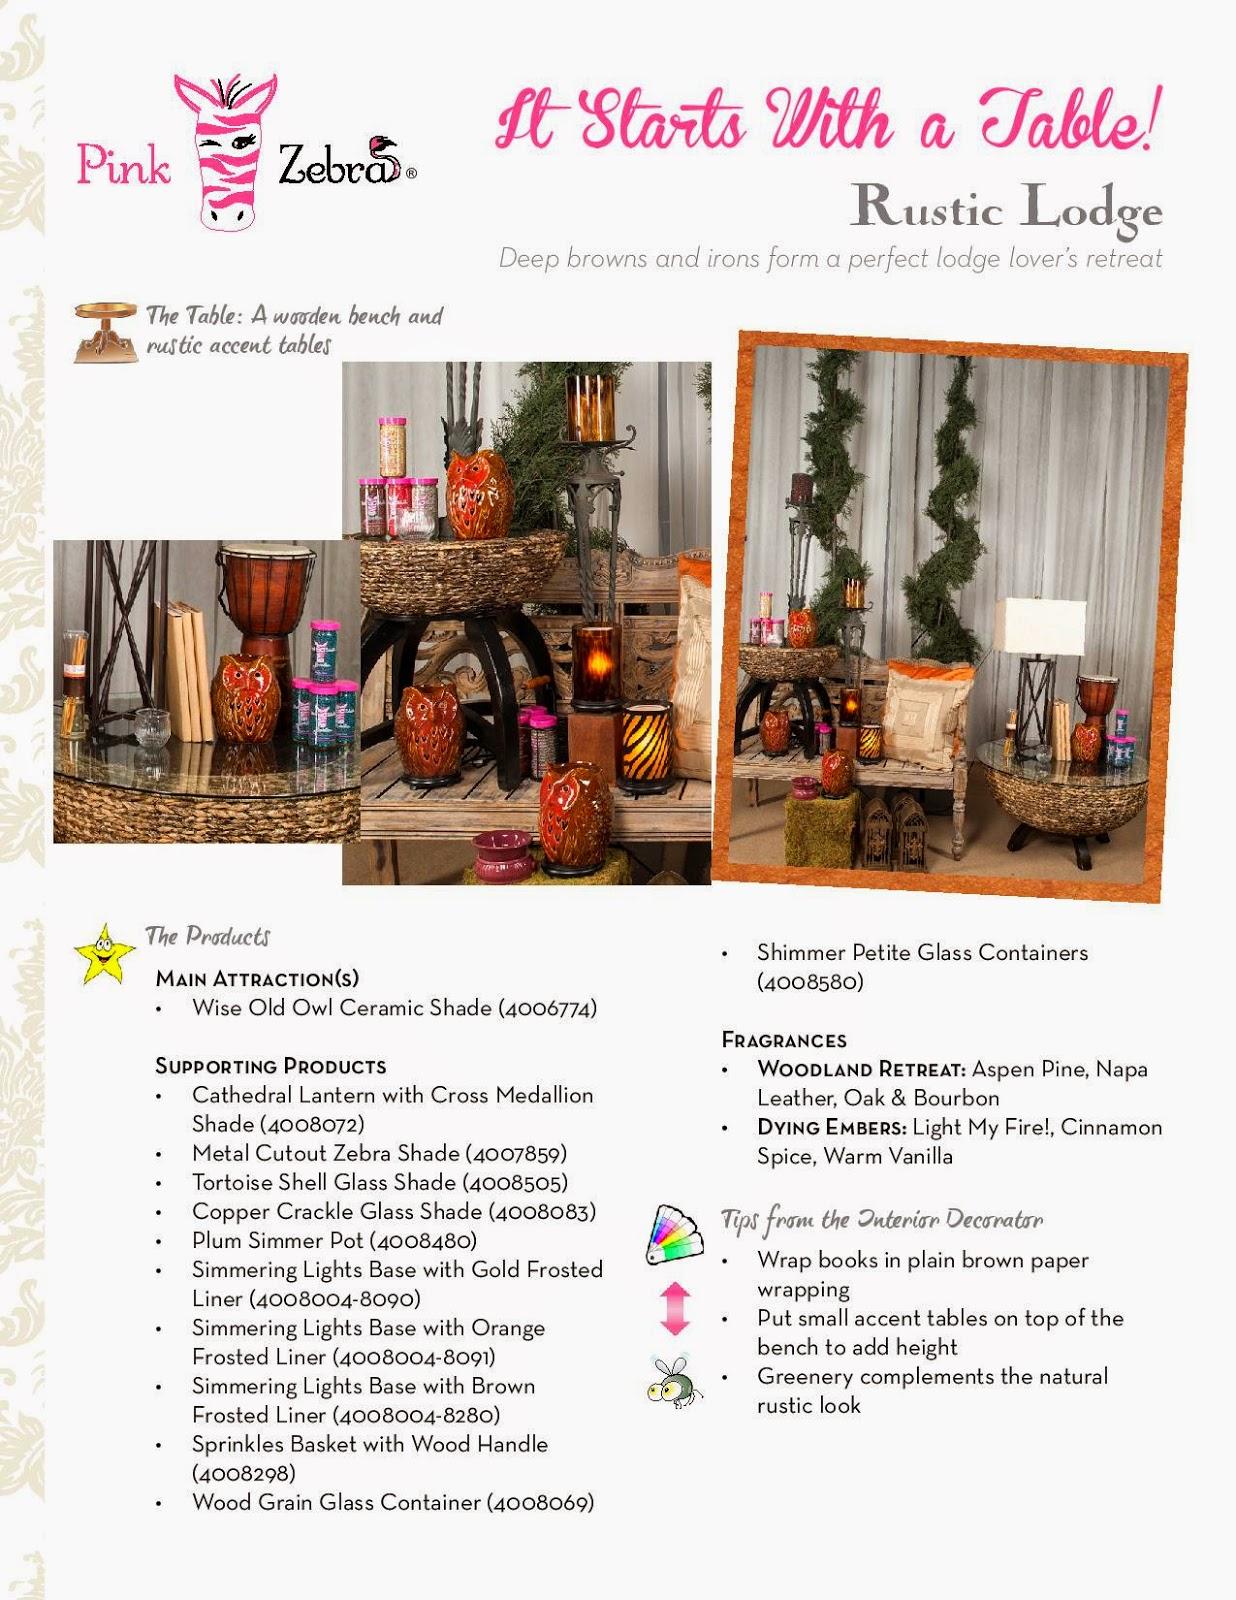 Pink Zebra Rustic Lodge Image